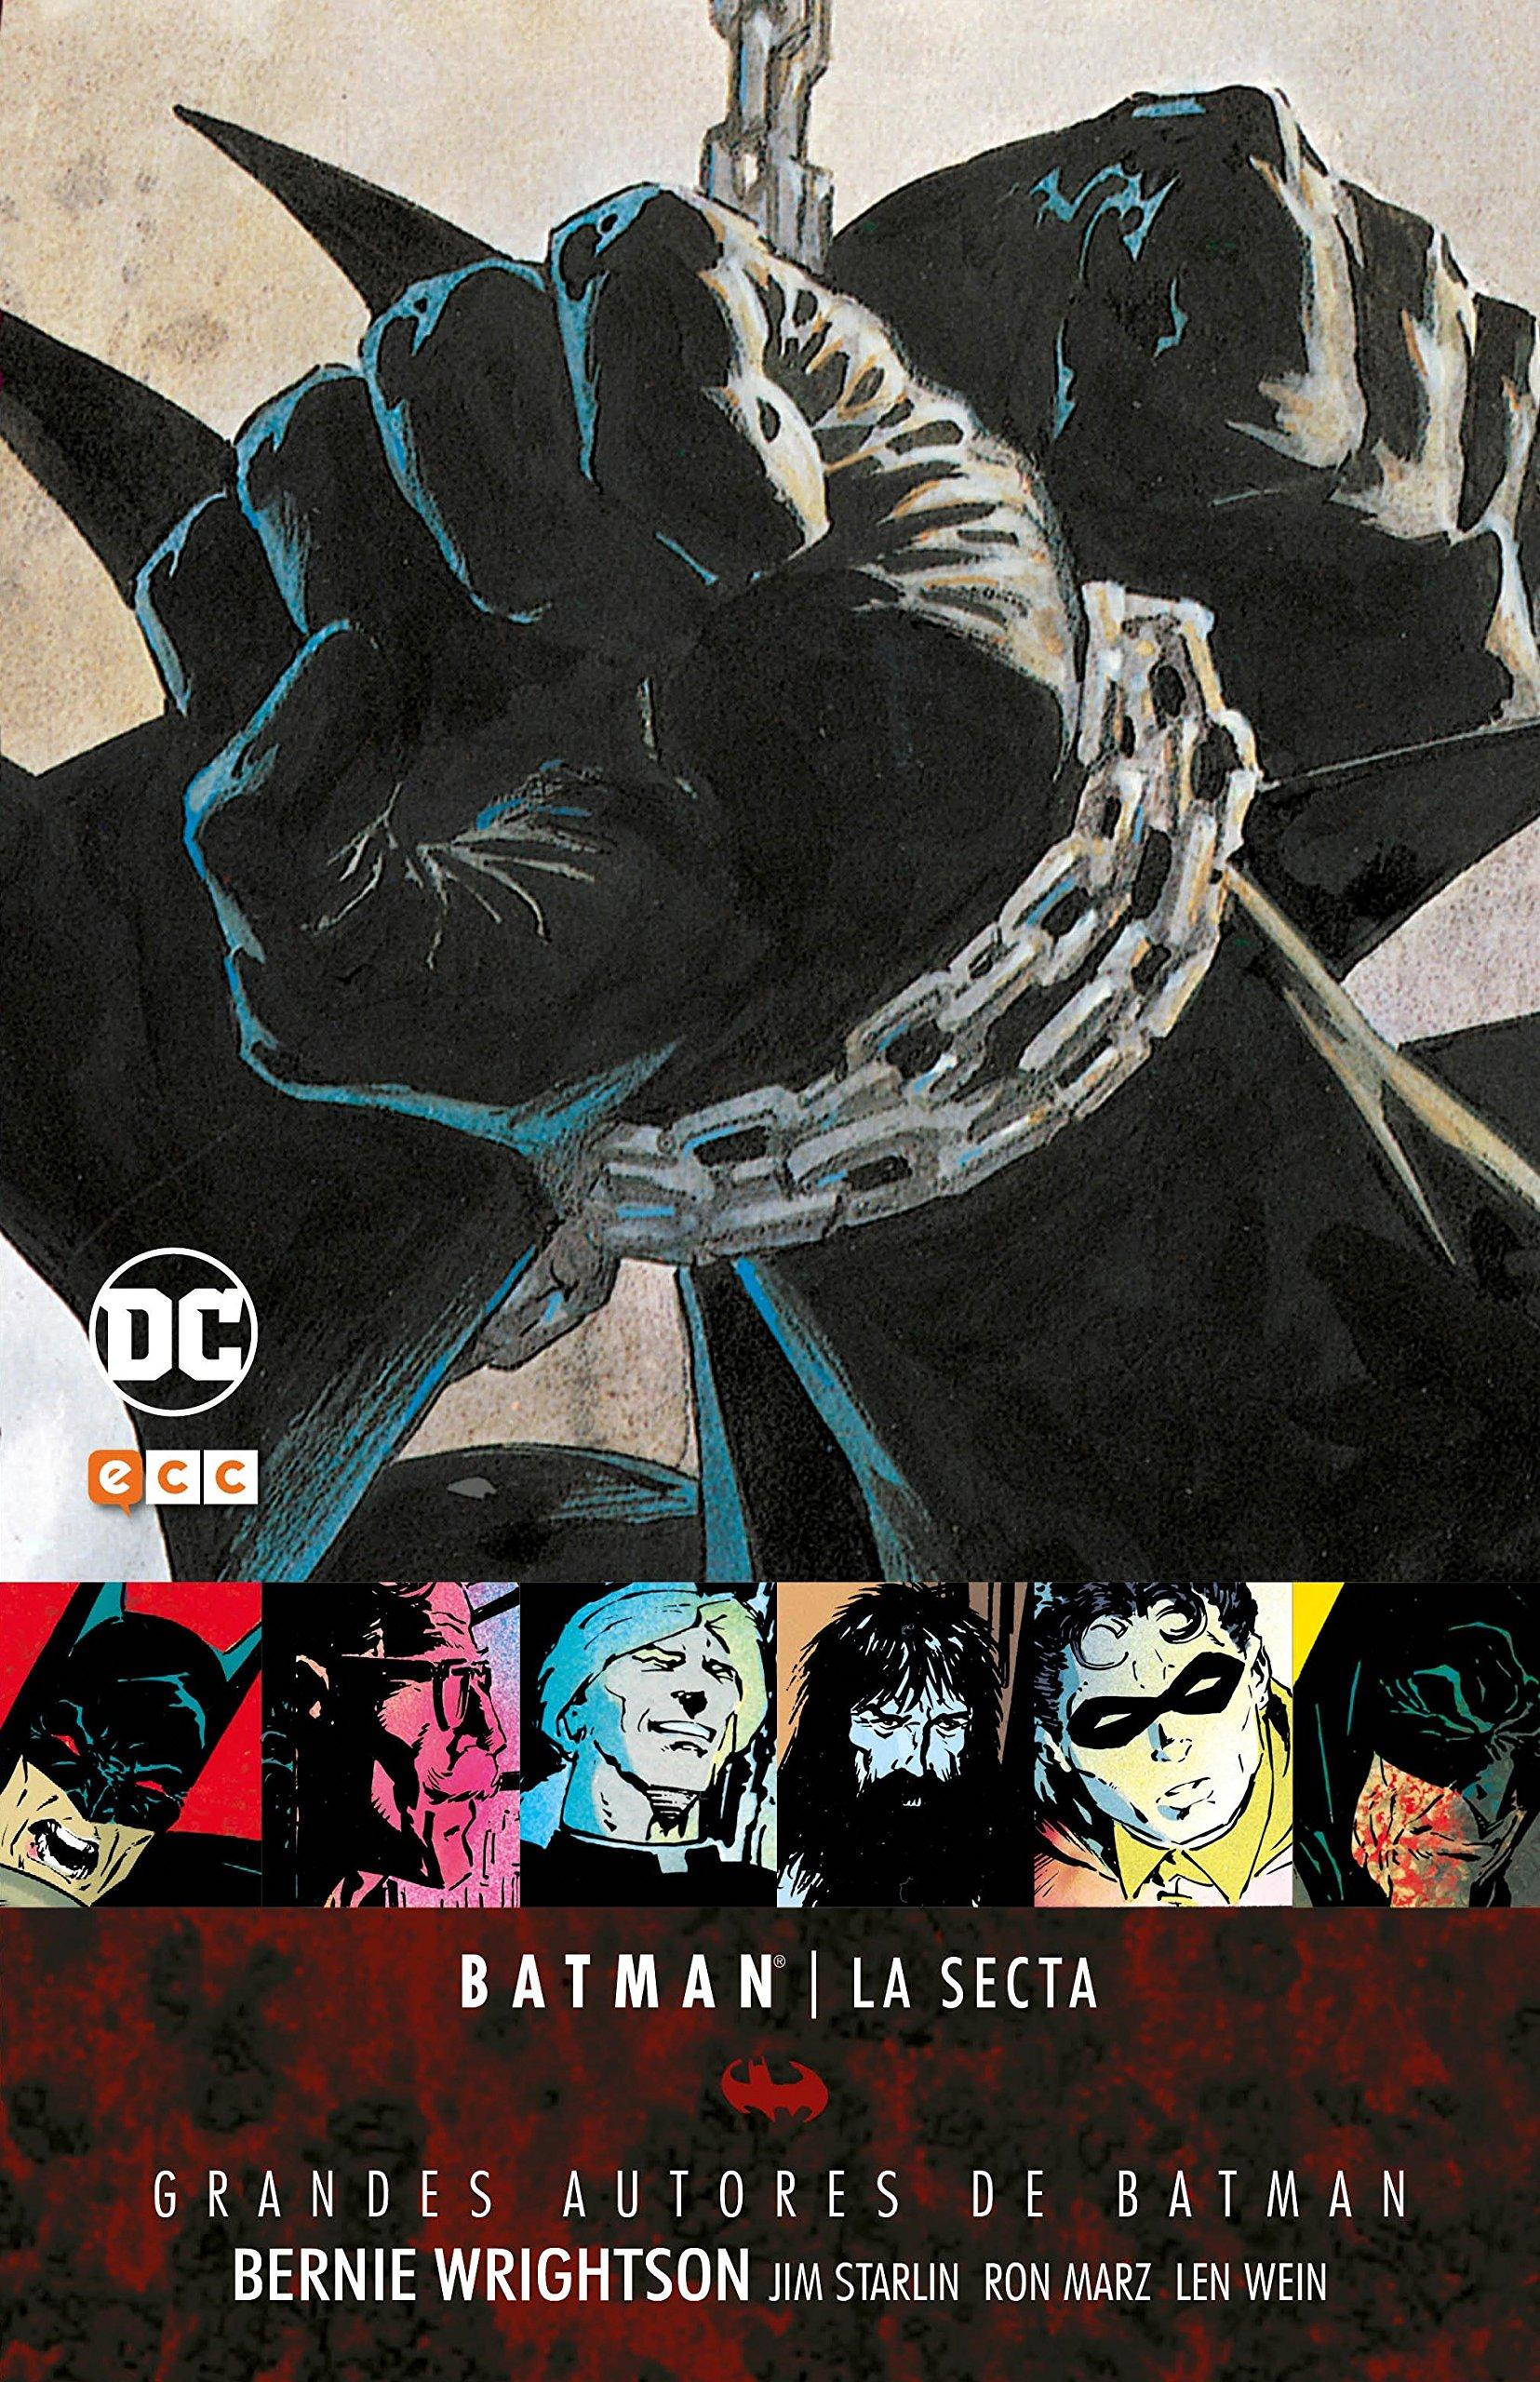 Grandes autores de Batman: Bernie Wrightson - La secta 2a ...